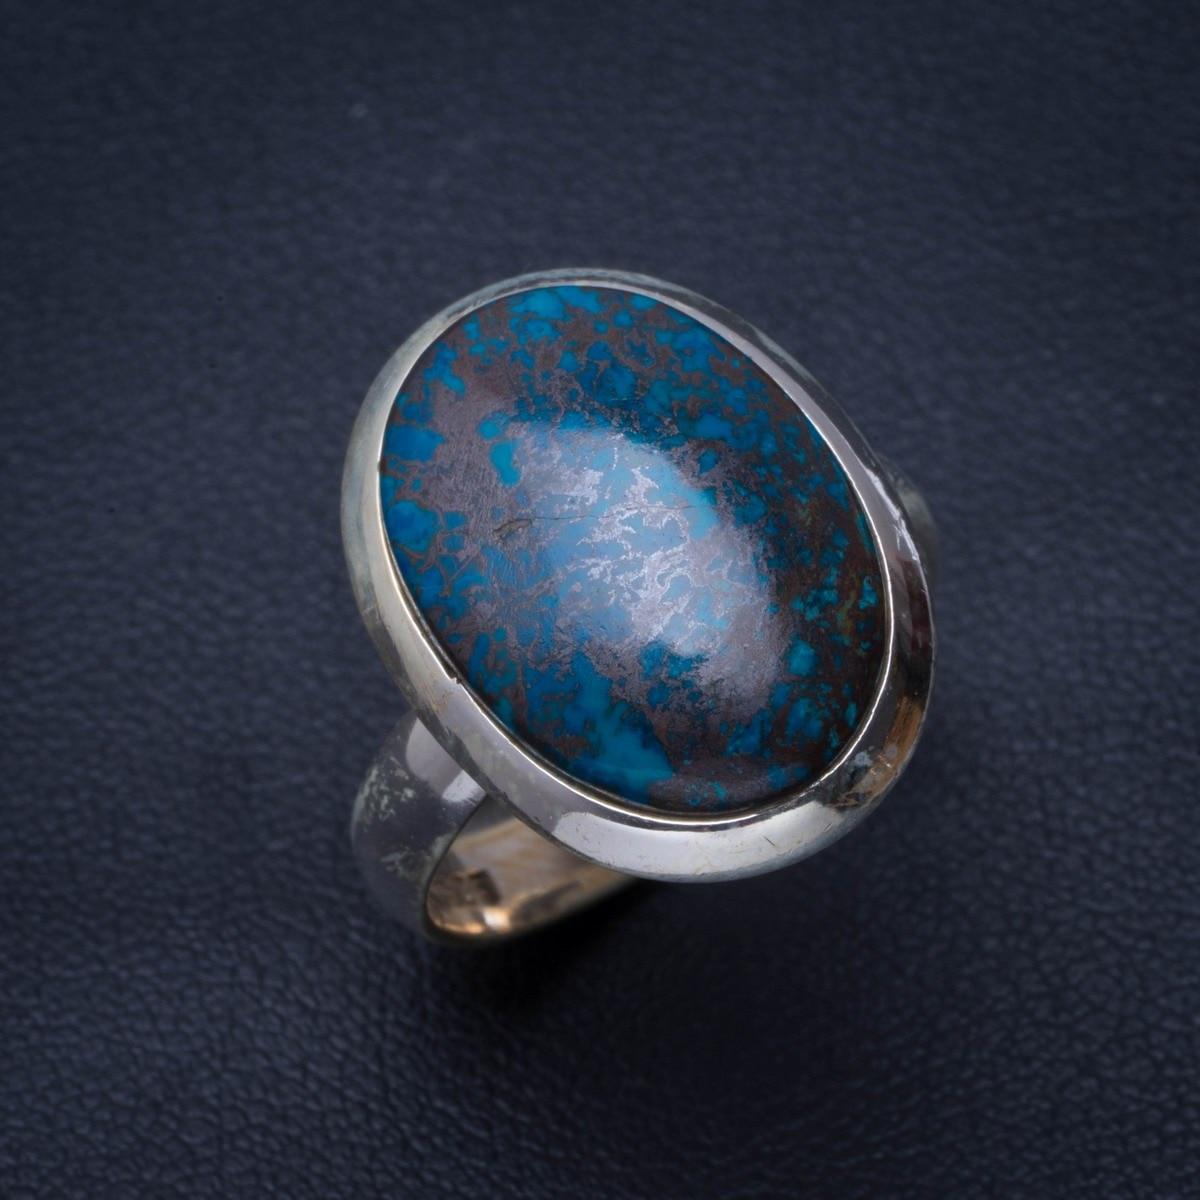 Crisocola Natural hecho a mano único 925 anillo de plata esterlina 7,75 B1427